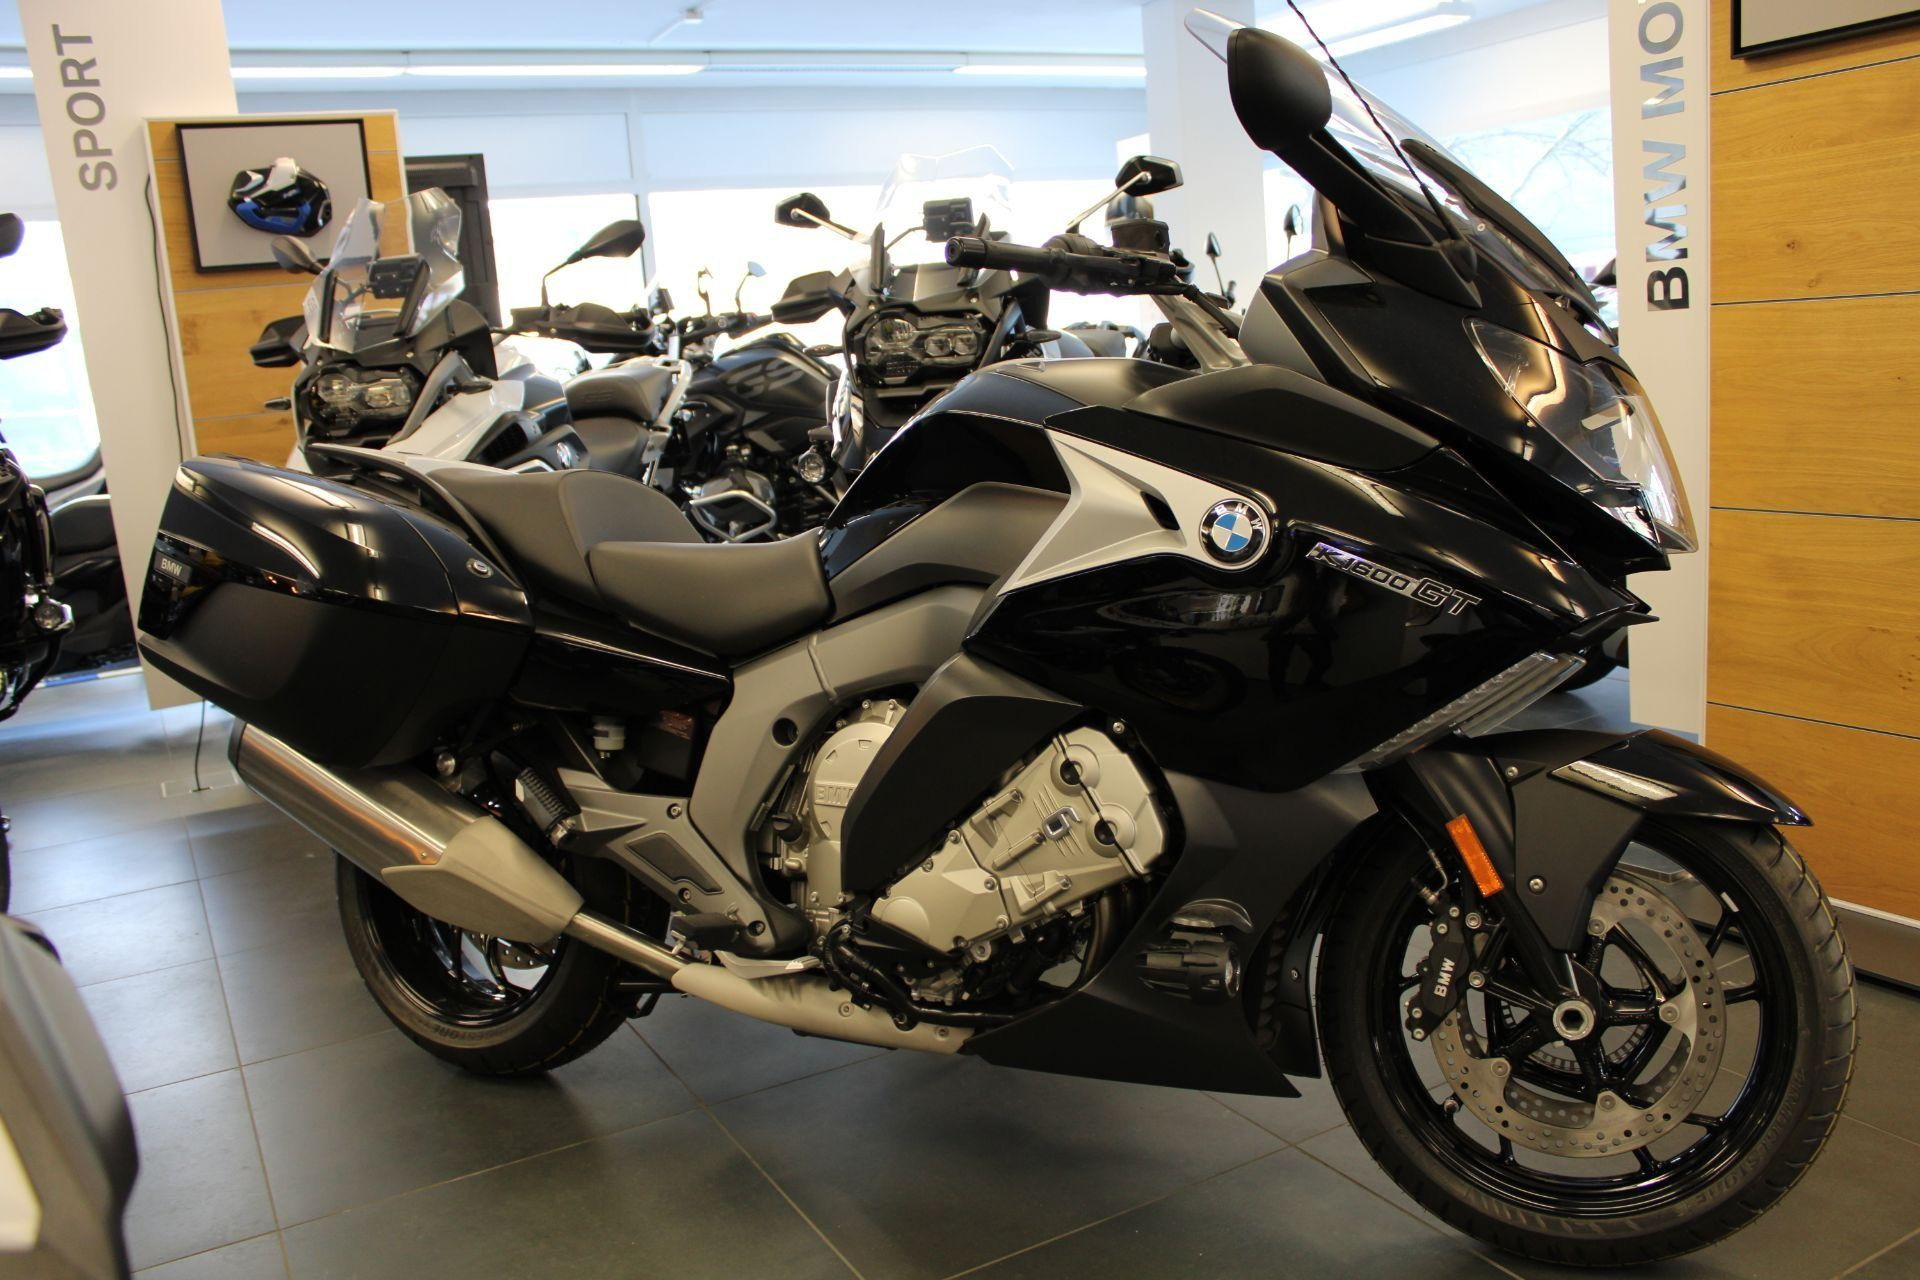 Motorrad Mieten & Roller Mieten BMW K 1600 GT ABS